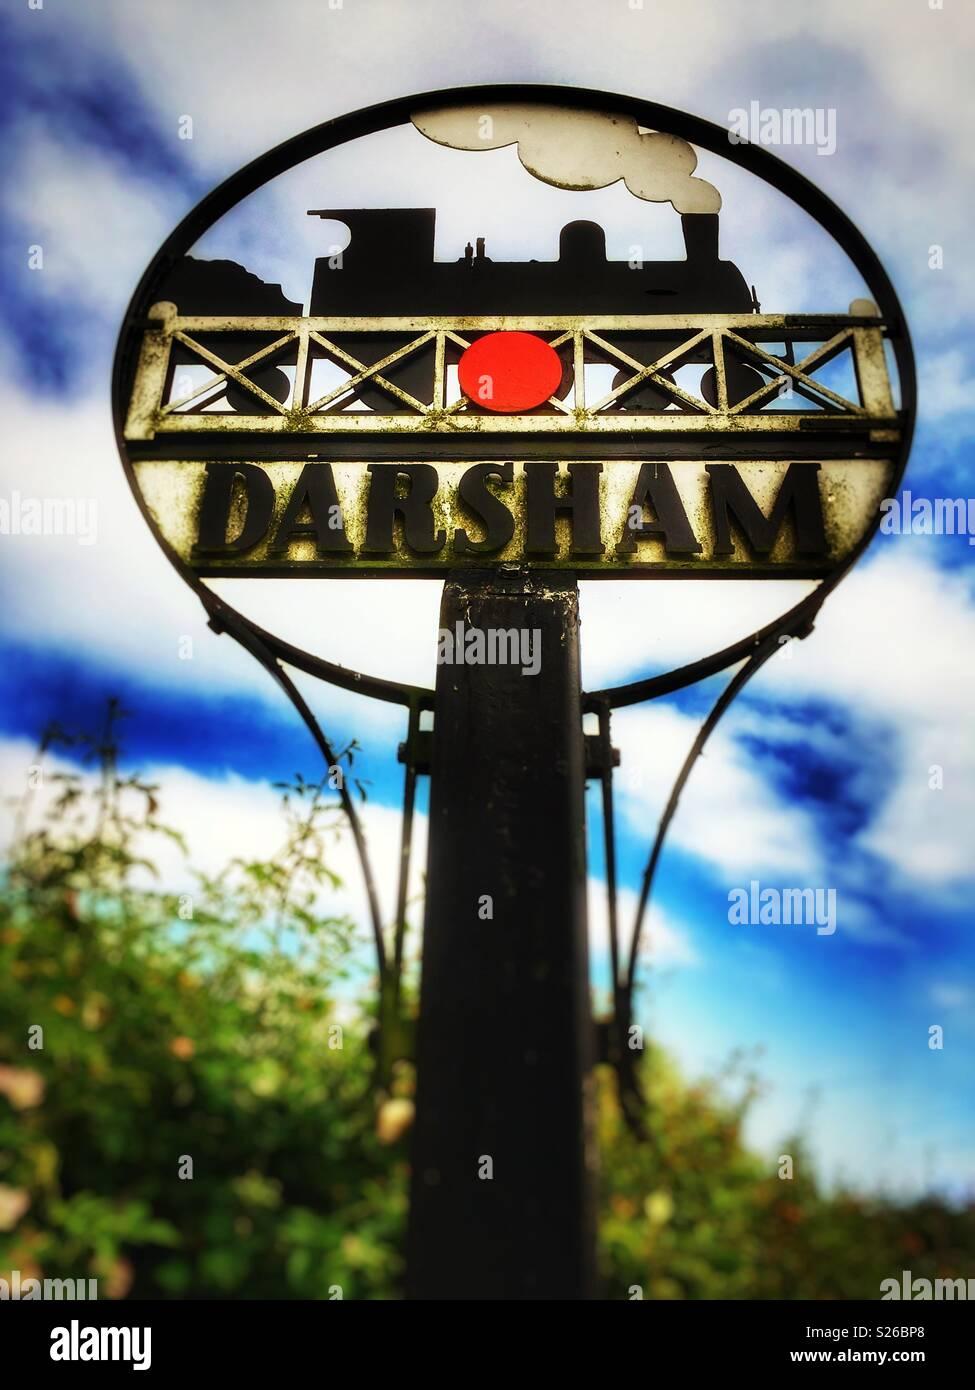 Darsham village sign, Suffolk, England. - Stock Image